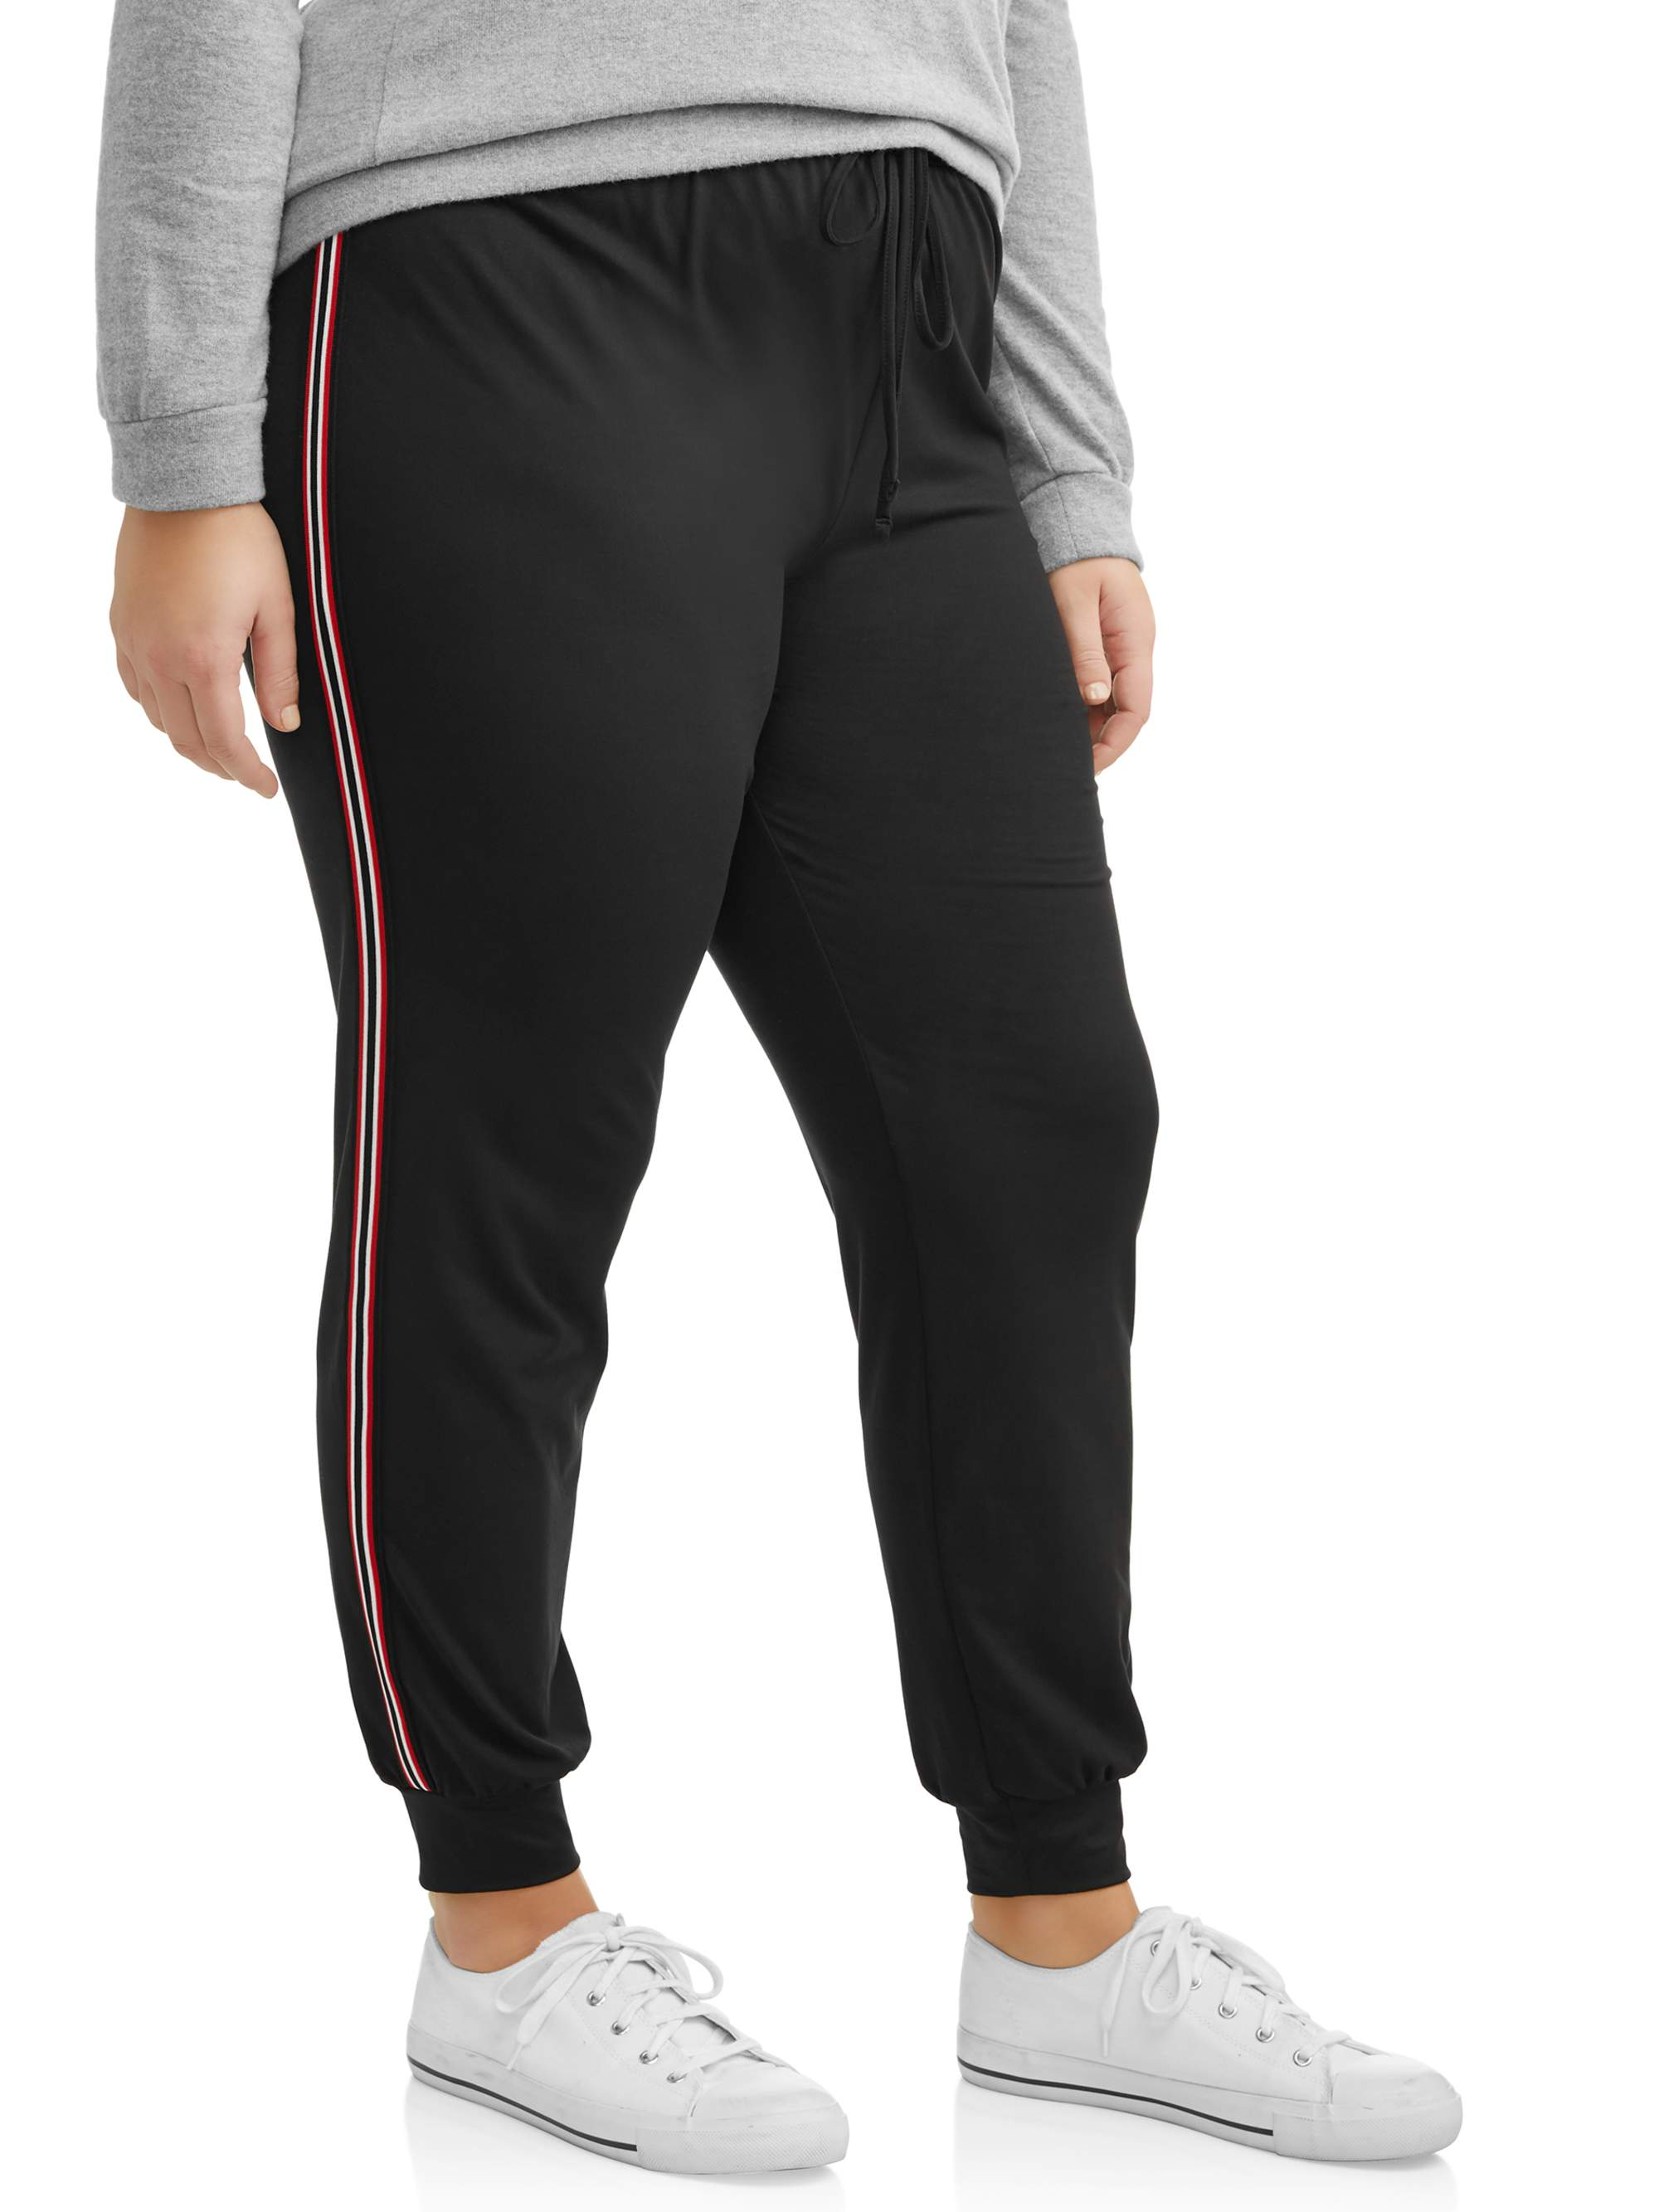 Juniors' Plus Size Super Soft Brushed Joggers with Varsity Stripe